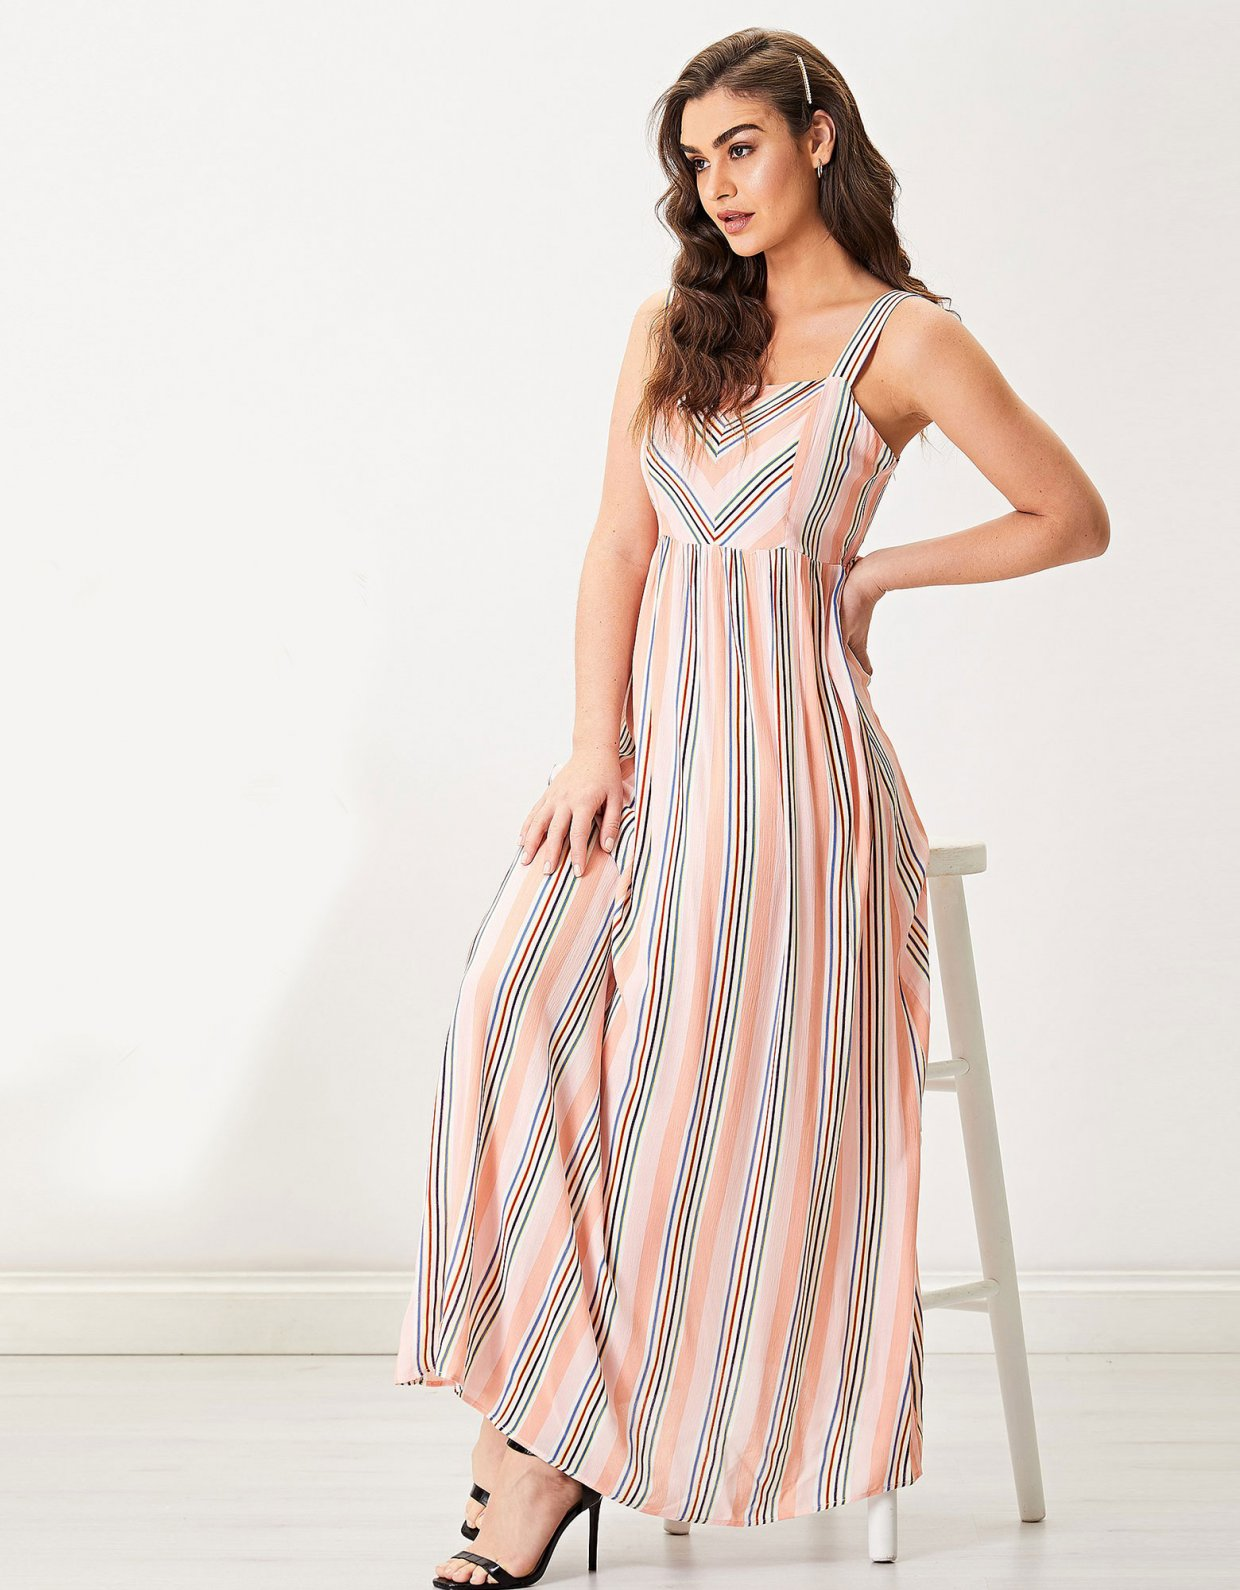 ANGELEYE Millie dress